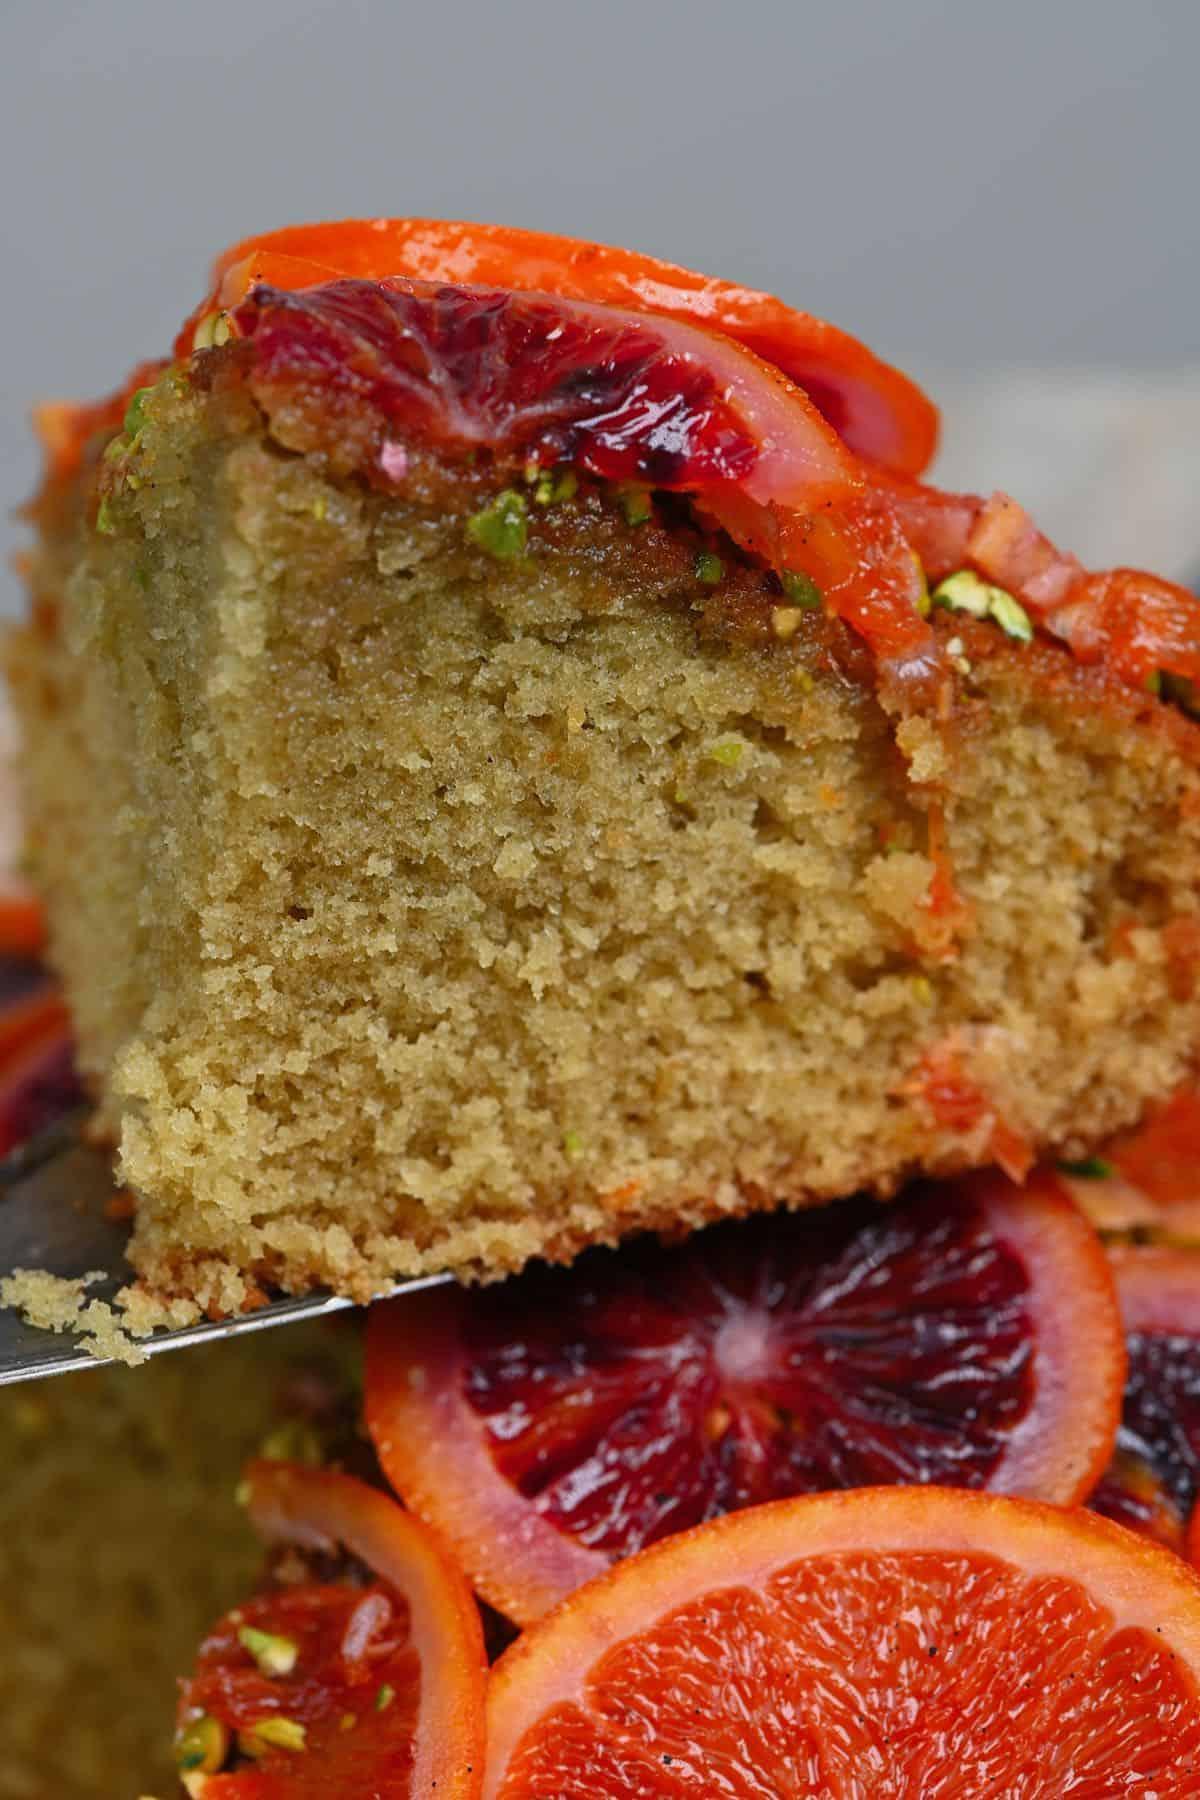 A close up of a slice of orange pistachio cake